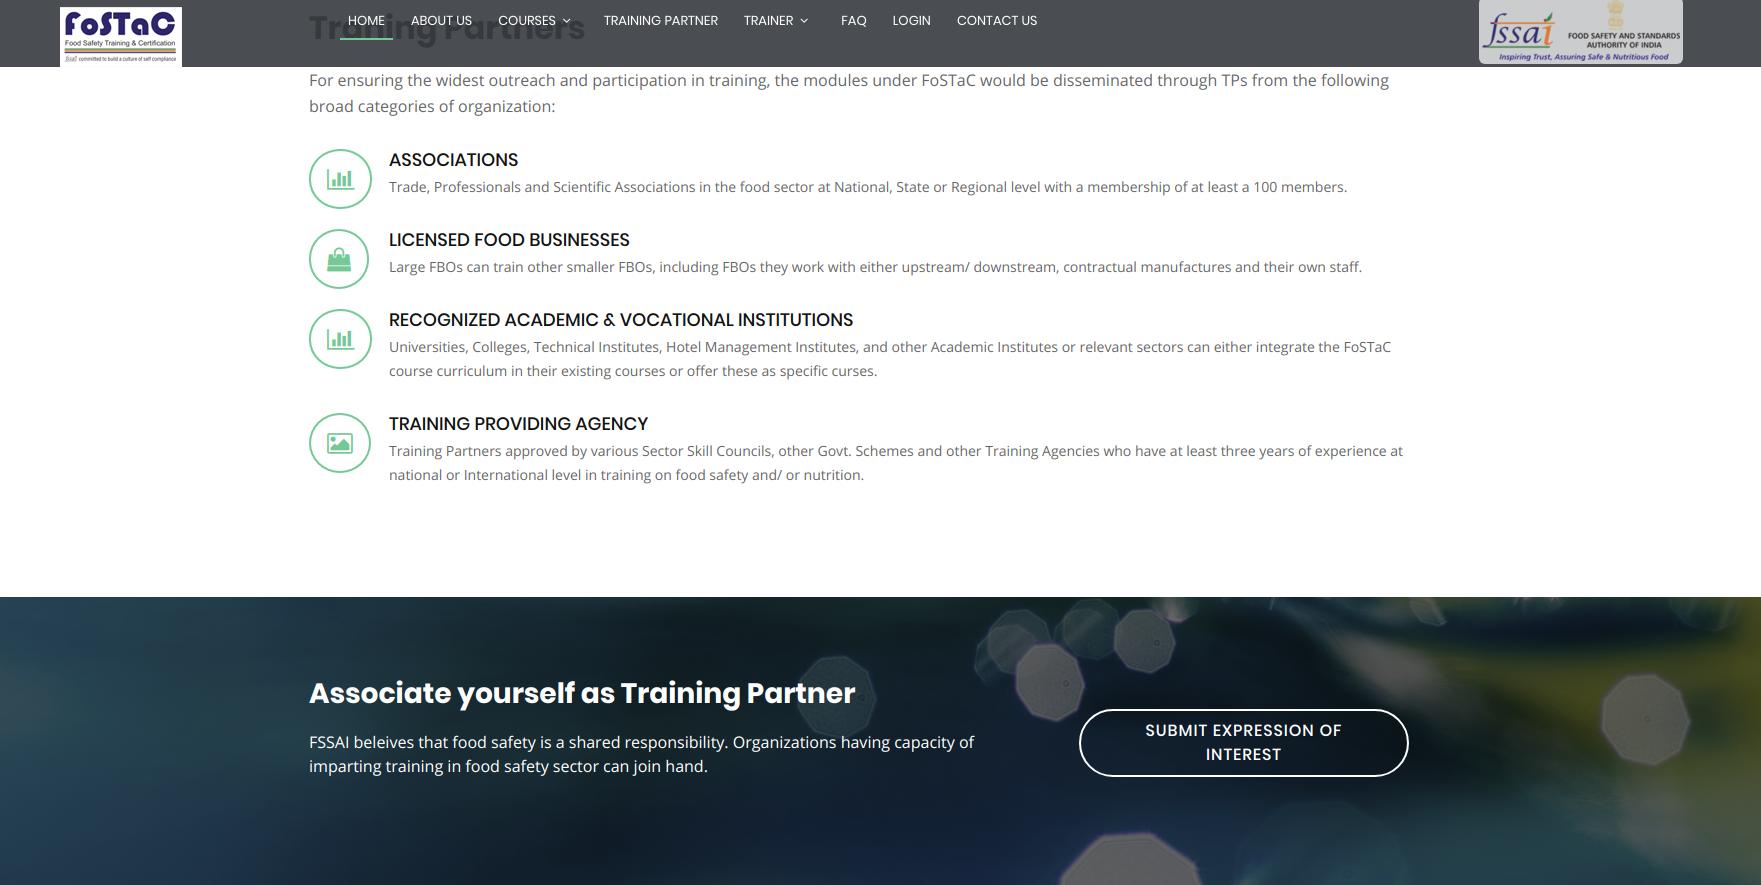 FOSTAG - Training Partner Application Form